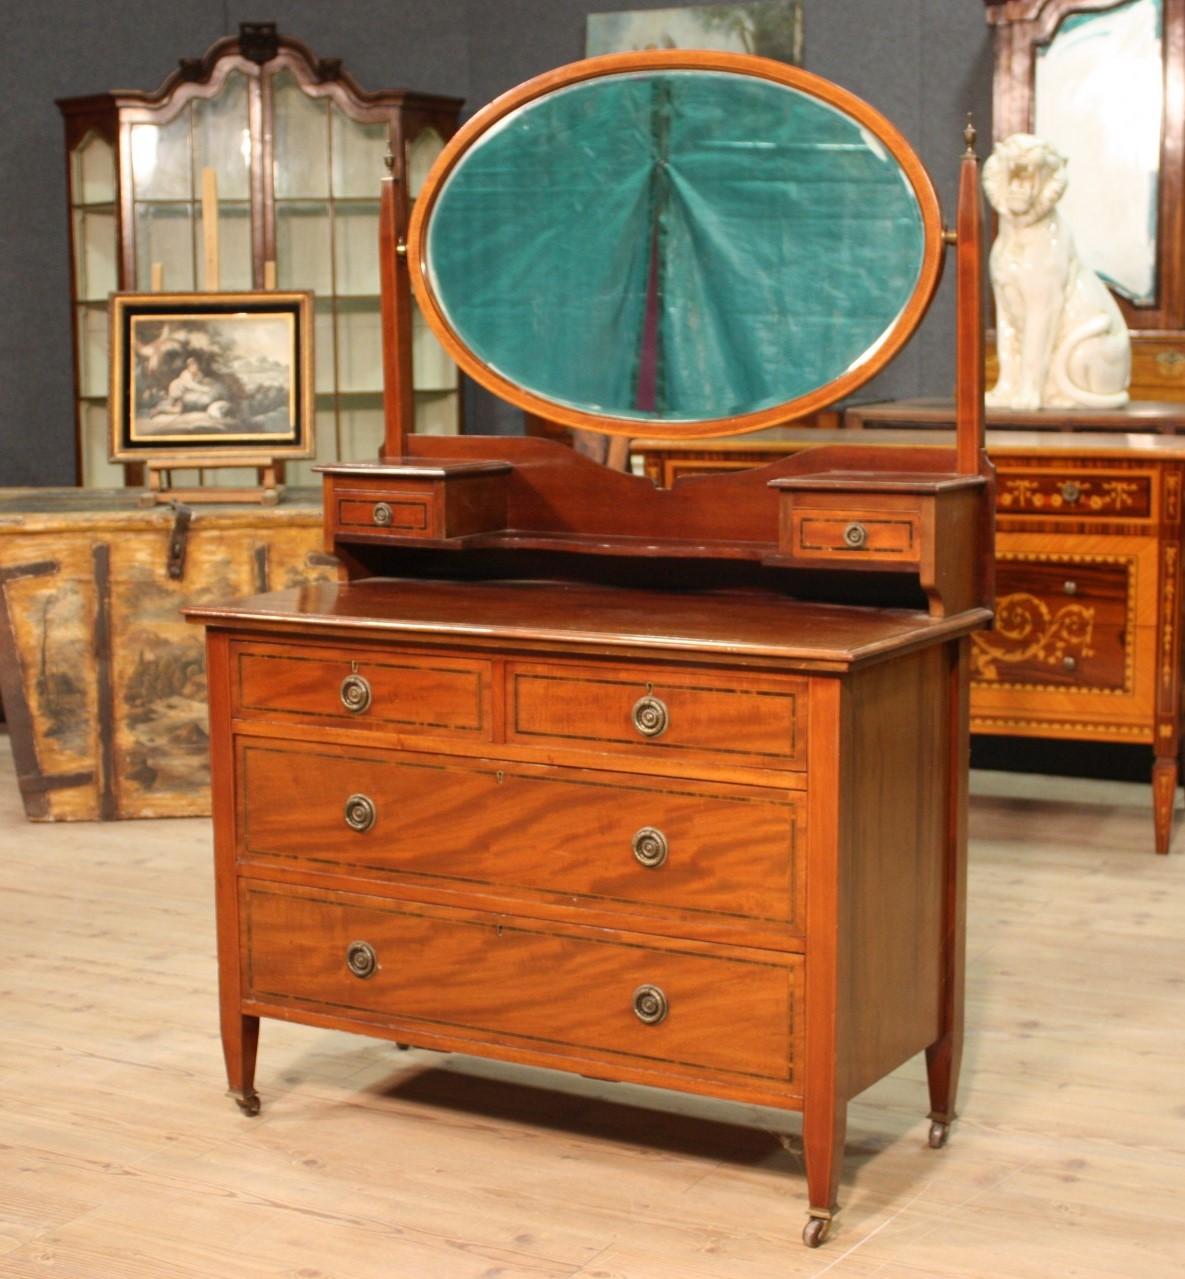 Awesome vendita mobili antichi on line images ameripest for Acquisto mobili antichi napoli